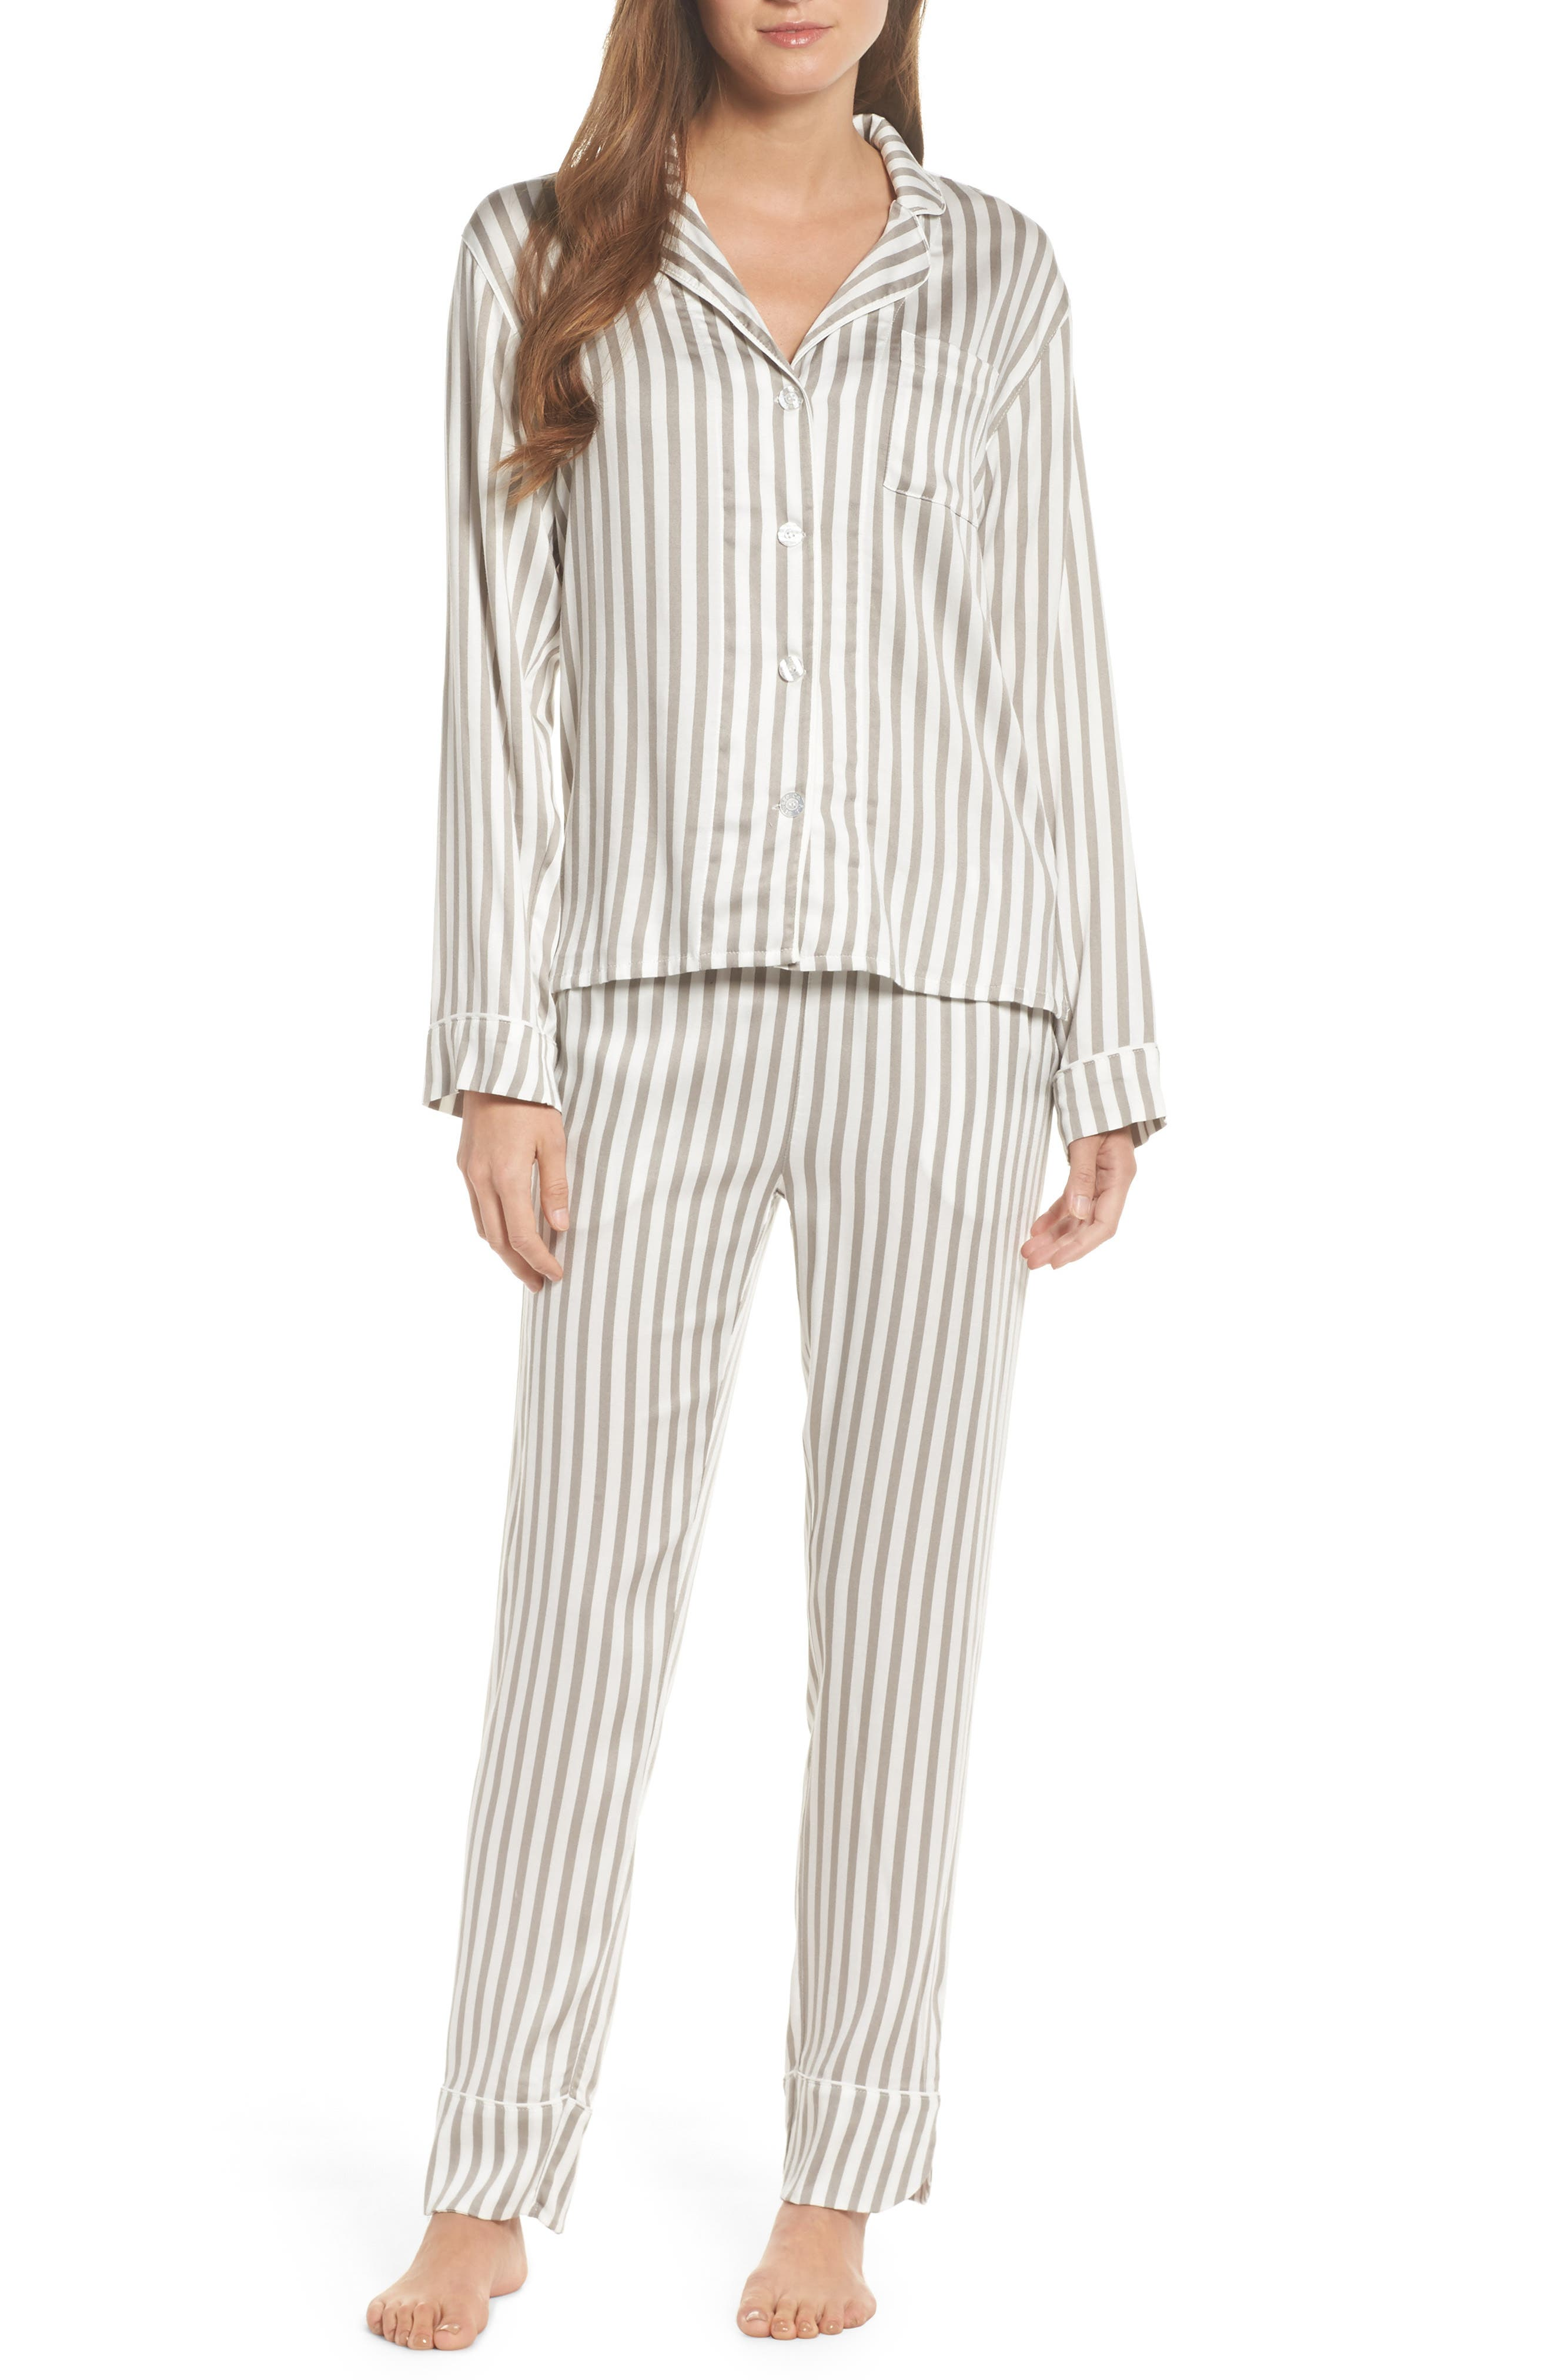 Stripe Pajamas,                             Main thumbnail 1, color,                             020